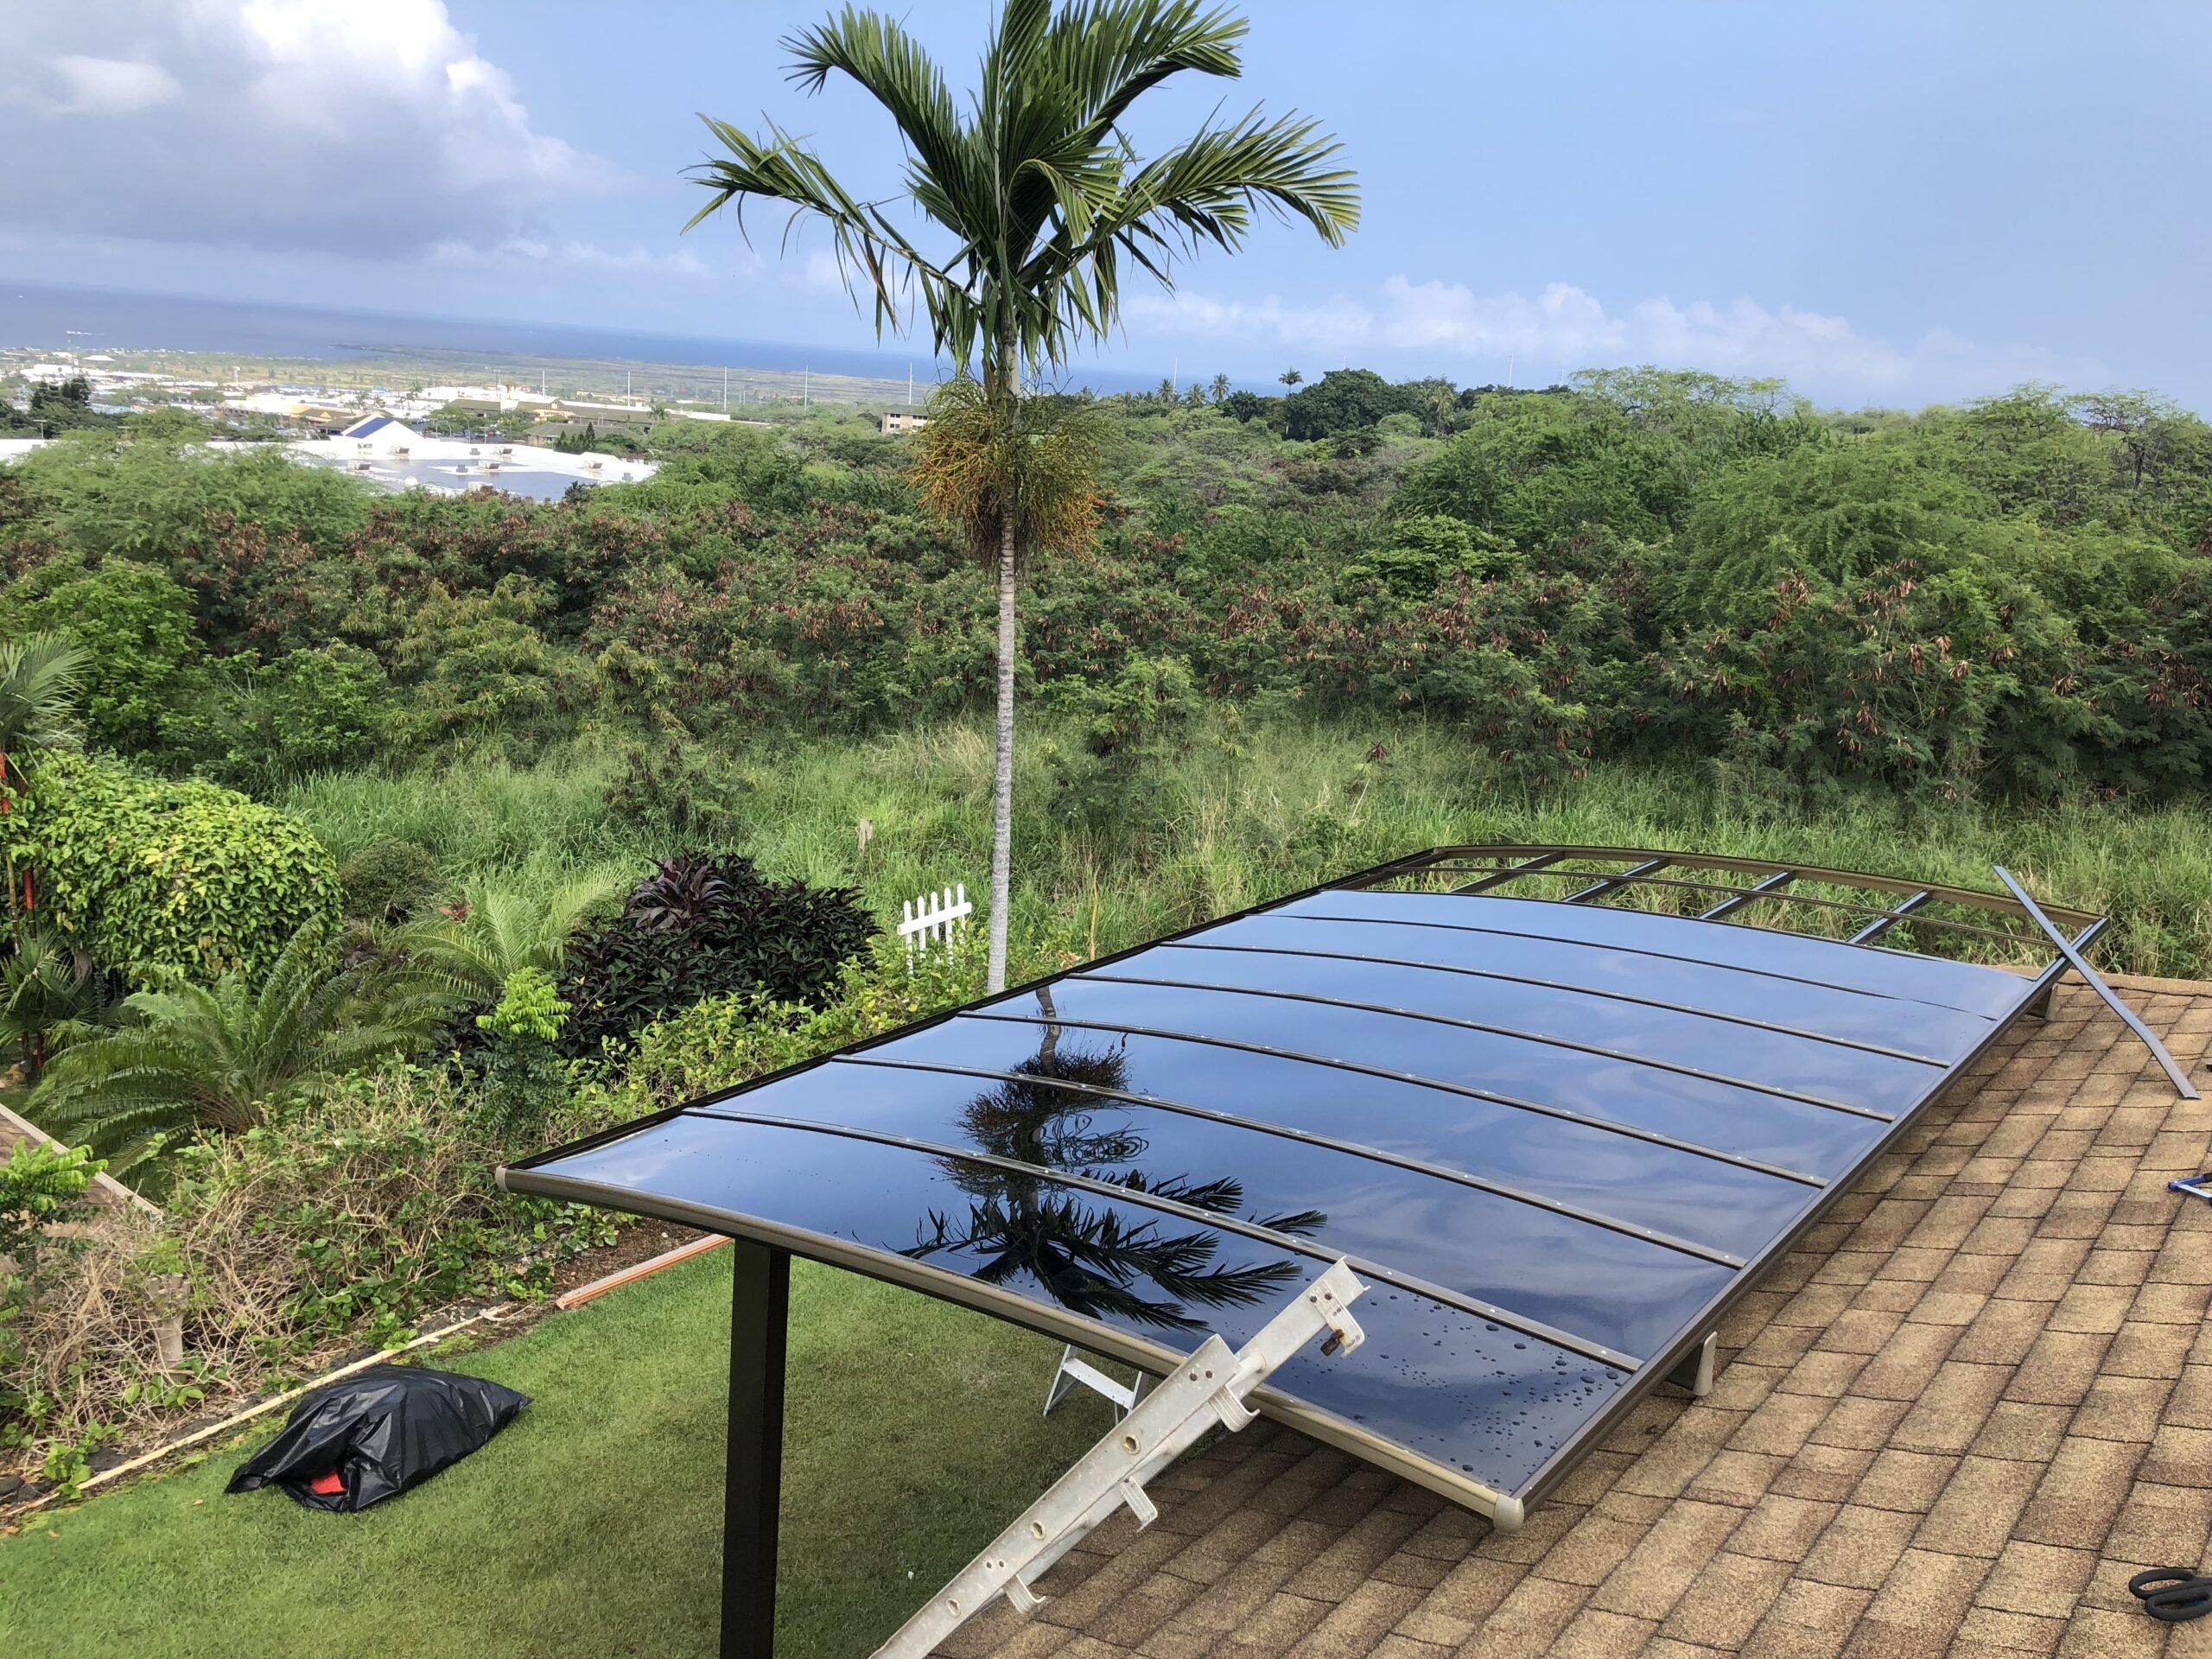 Singla brown carport with dark grey polycarbonate roof panels